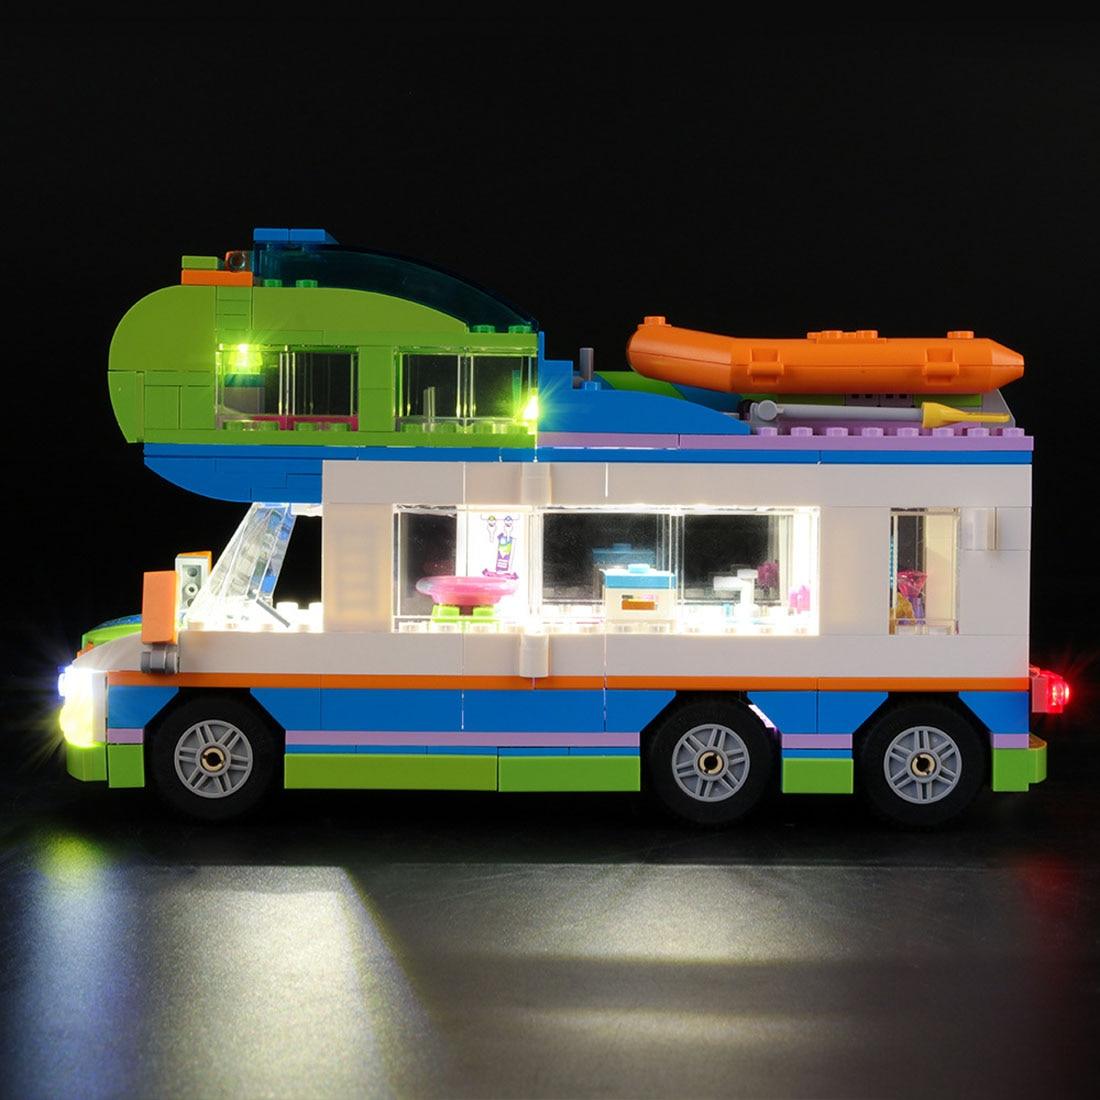 USB Powered LED Beleuchtung Kit für Freunde Mia der Camper Van 41339 (LED Enthalten Nur, Keine Kit)